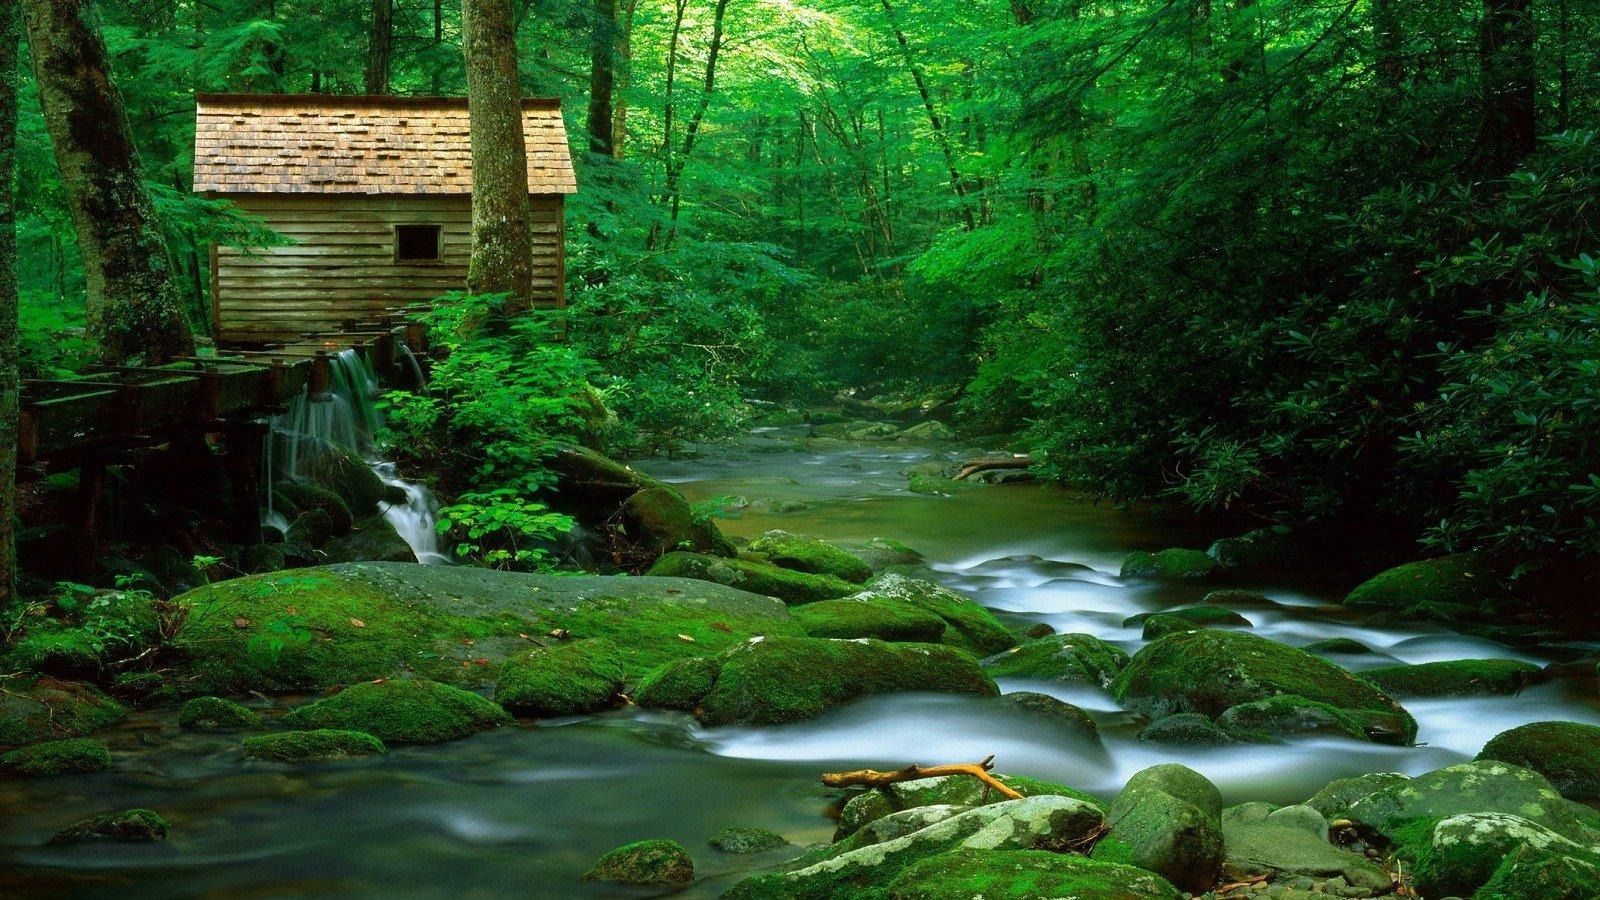 Hd wallpaper nature green - Free Desktop Wallpaper Nature Forest Cool Hd Wallpapers